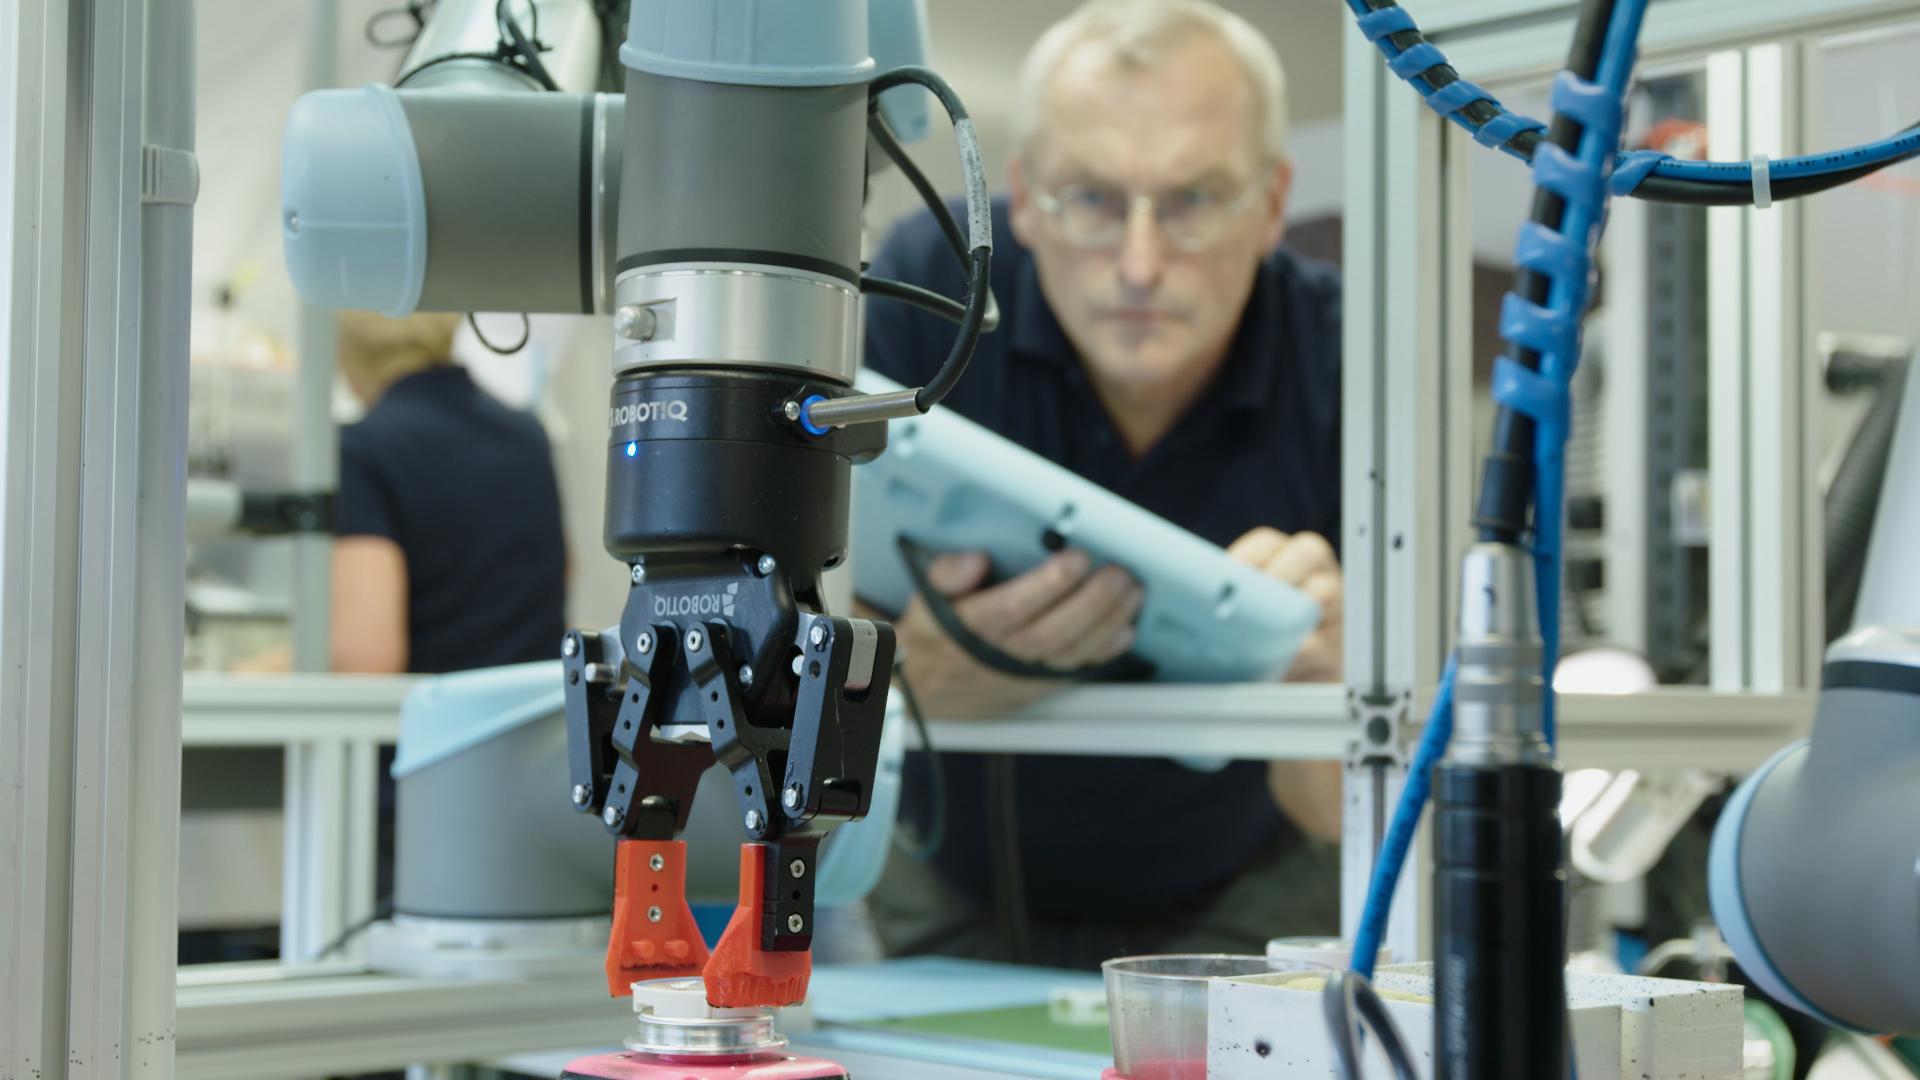 Six Steps for Preparing Your Team for Lean Robotics